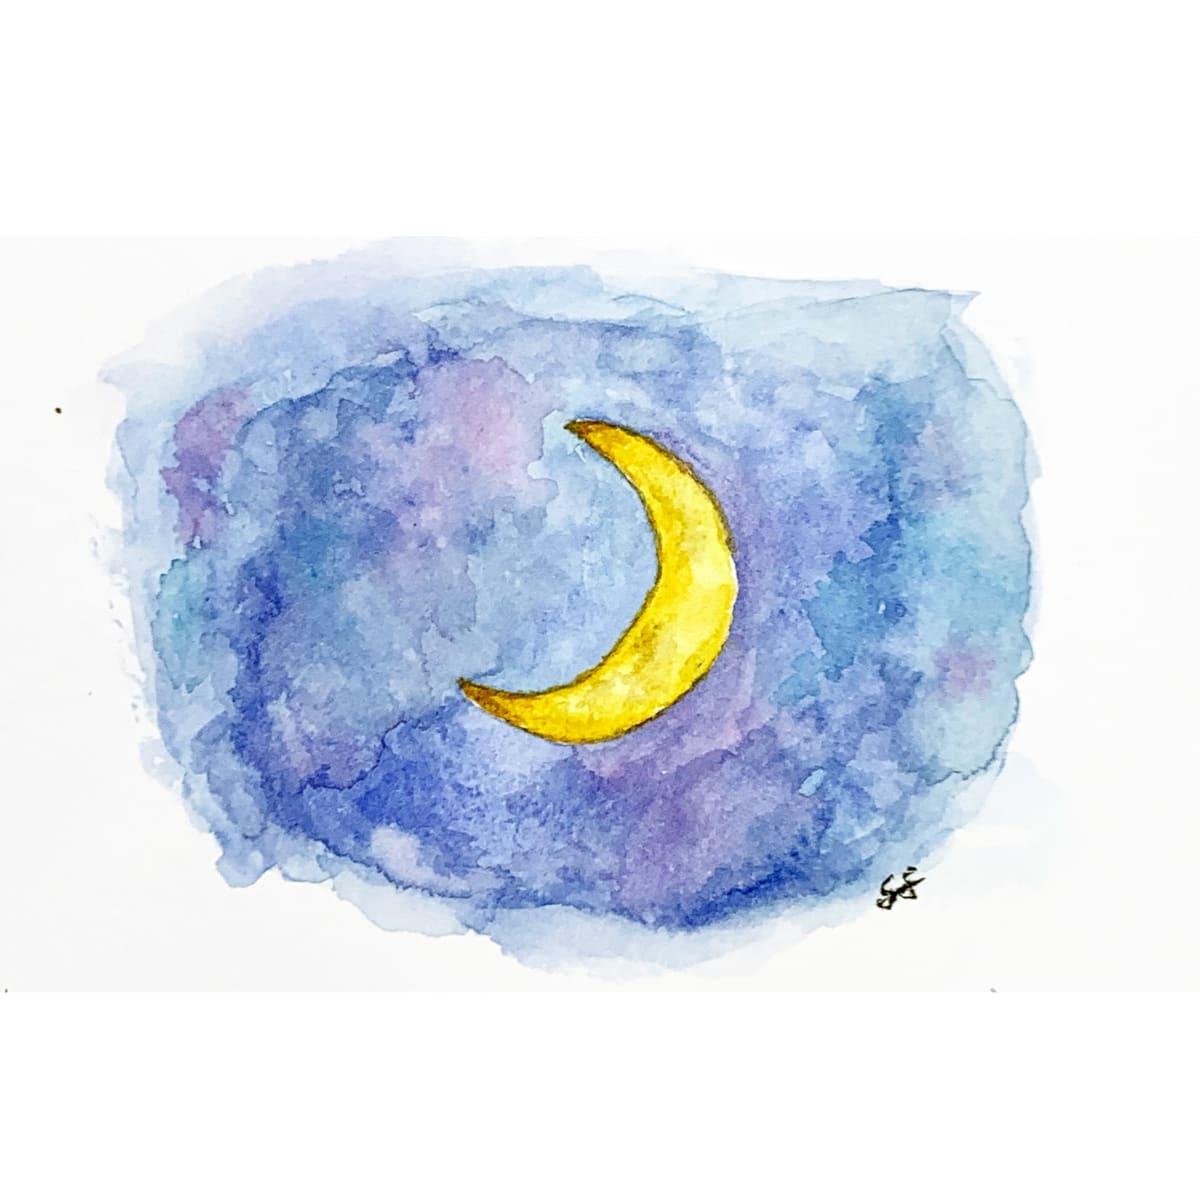 Mr Moonlight by Susi Schuele